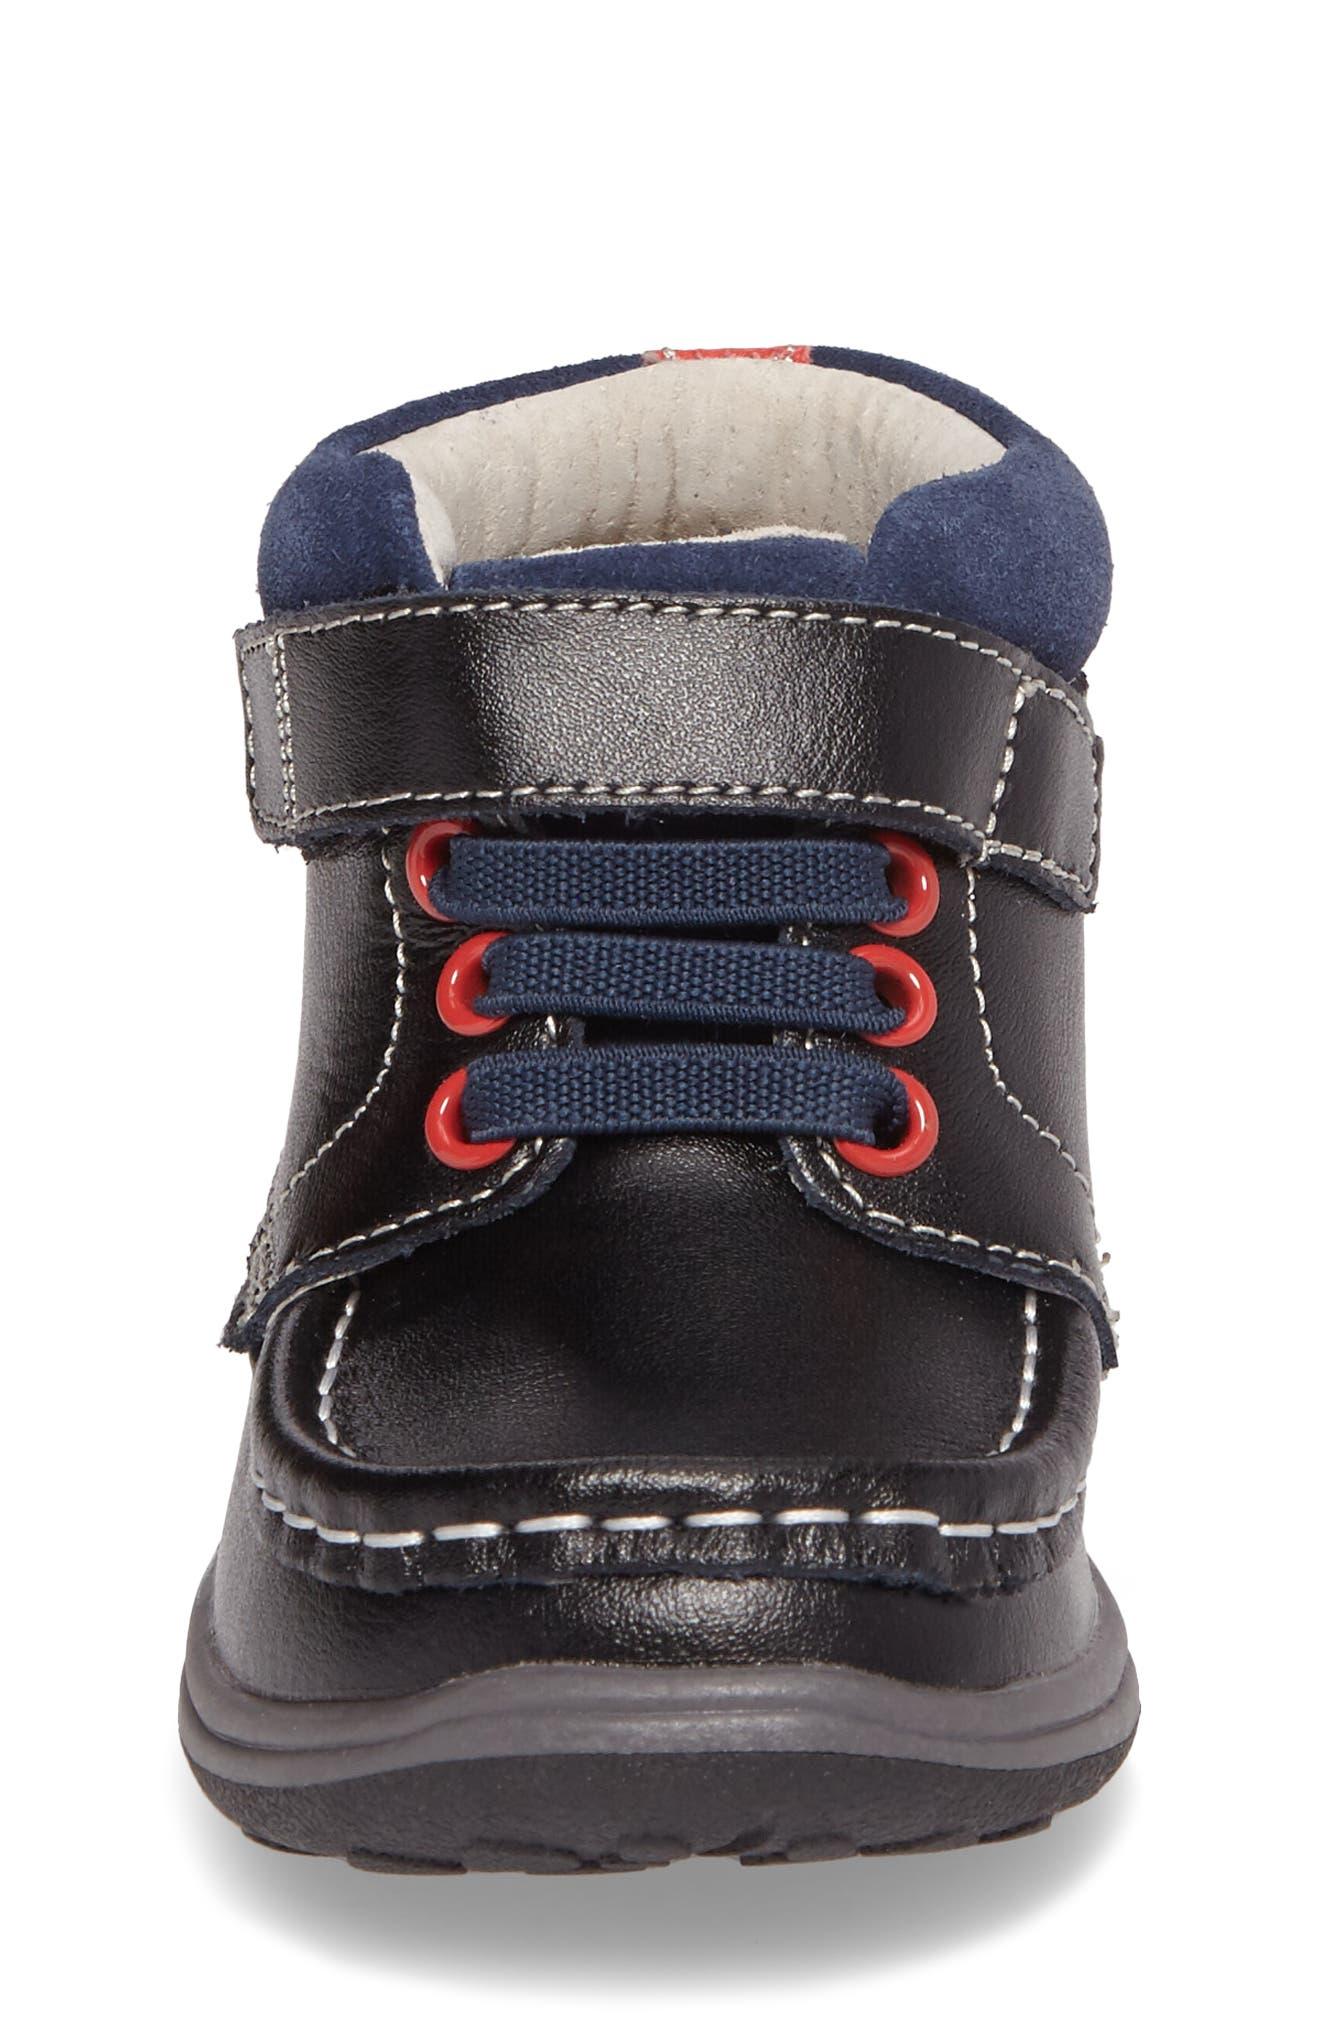 Alternate Image 4  - See Kai Run Owen High Top Sneaker Bootie (Baby, Walker & Toddler)